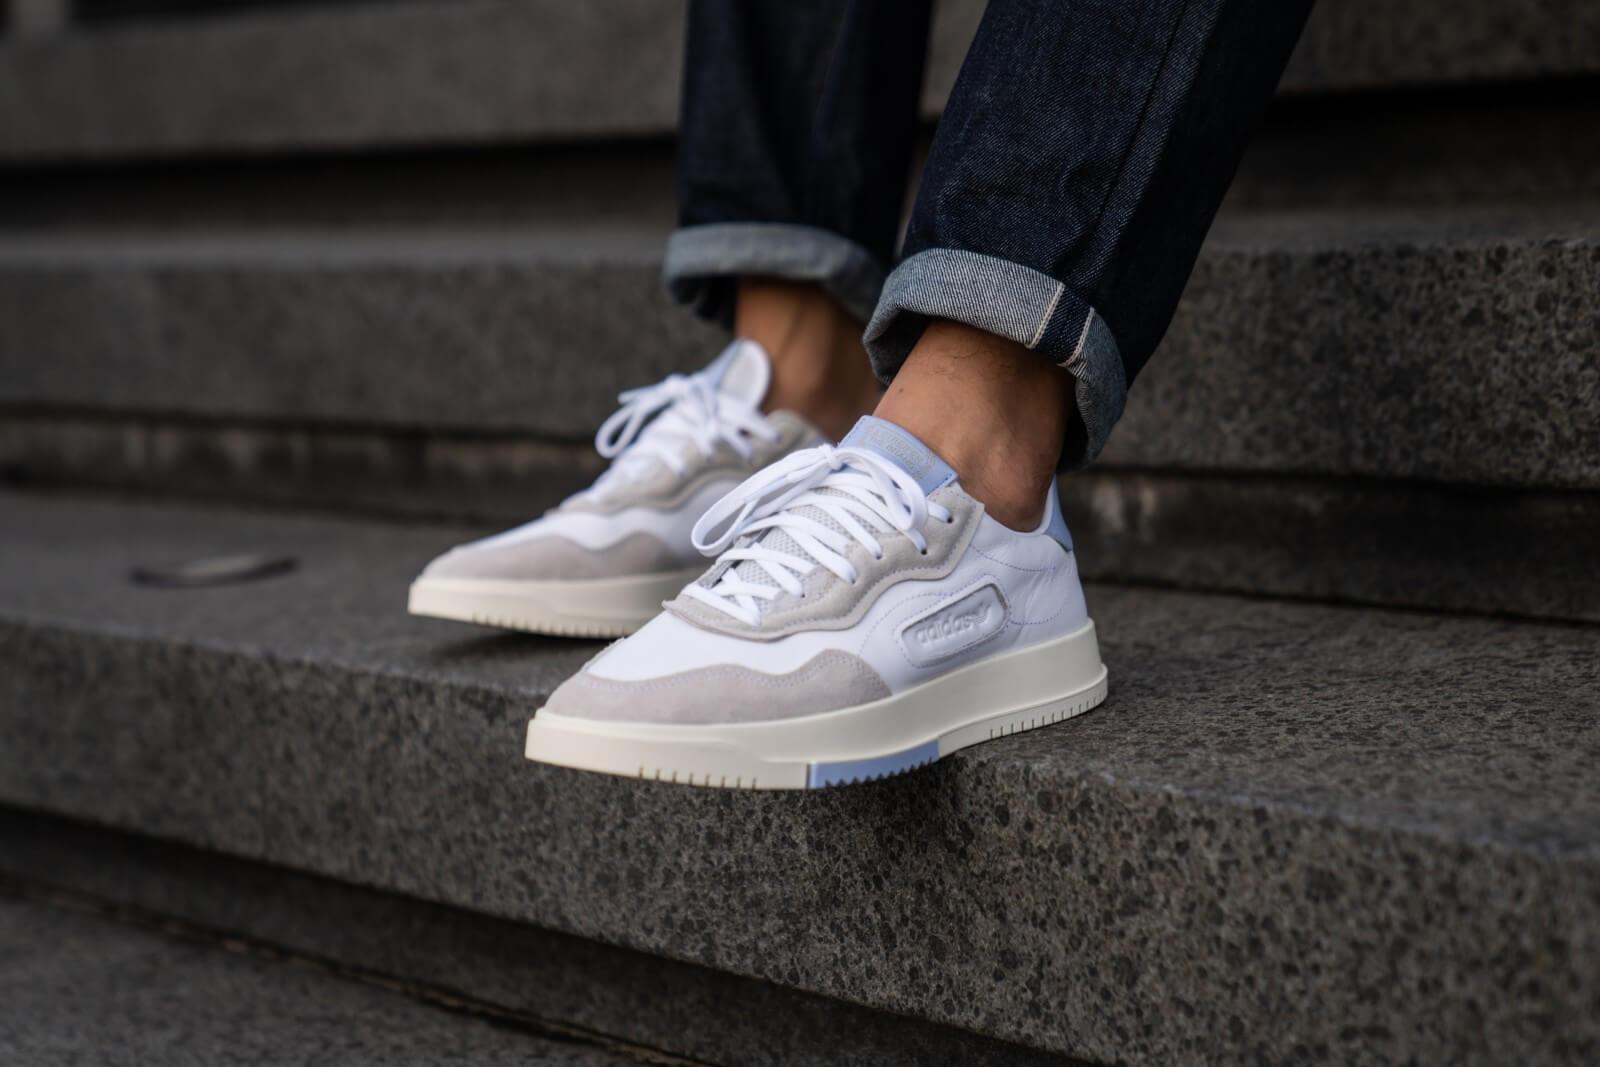 Adidas SC Premiere Footwear White